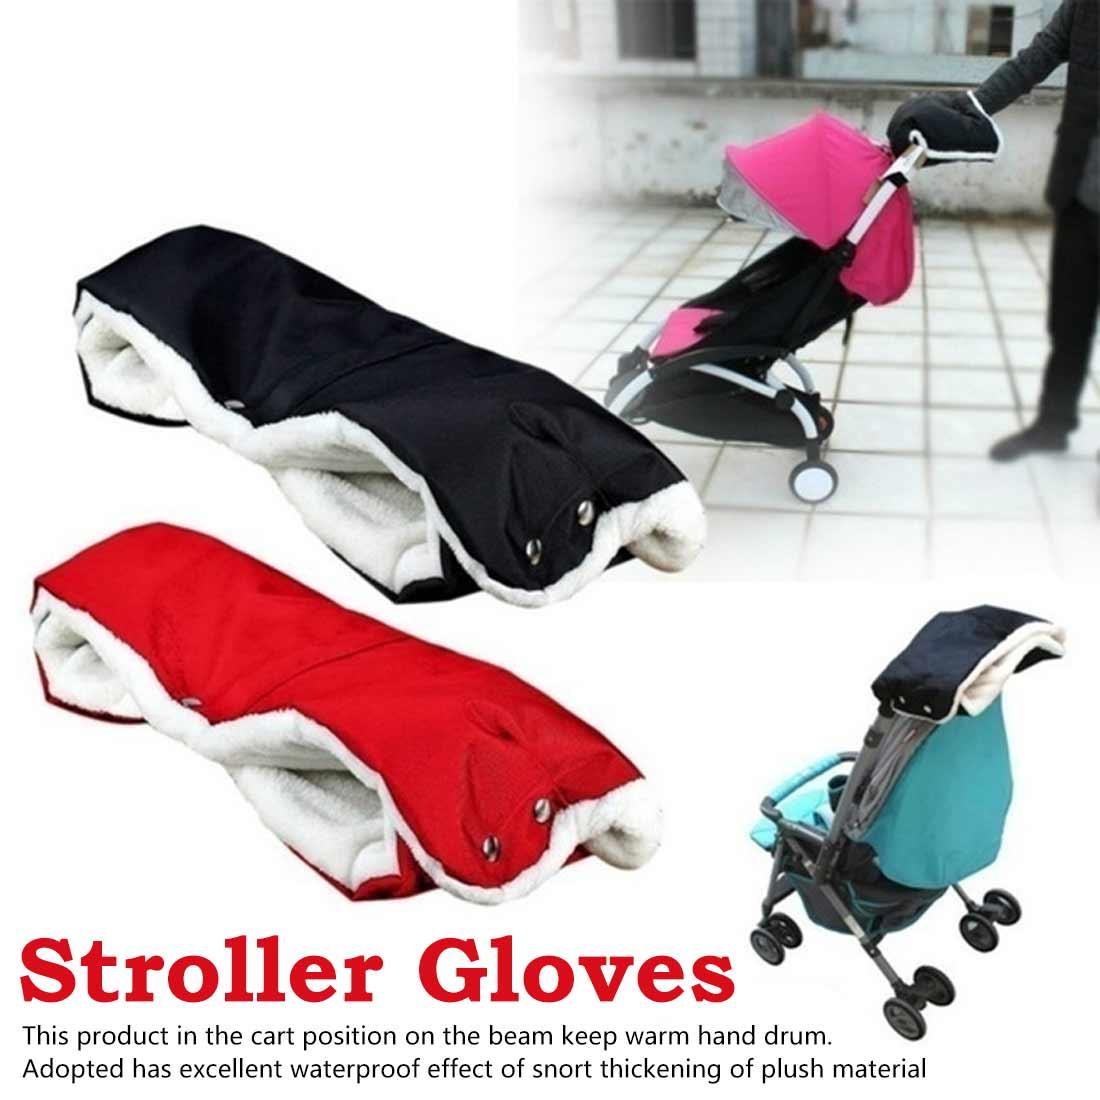 Warmer Winter Pram Clutch Cart Thick Fleece Gloves Kids Baby Pram Stroller Accessory Hand Muff Waterproof Gloves